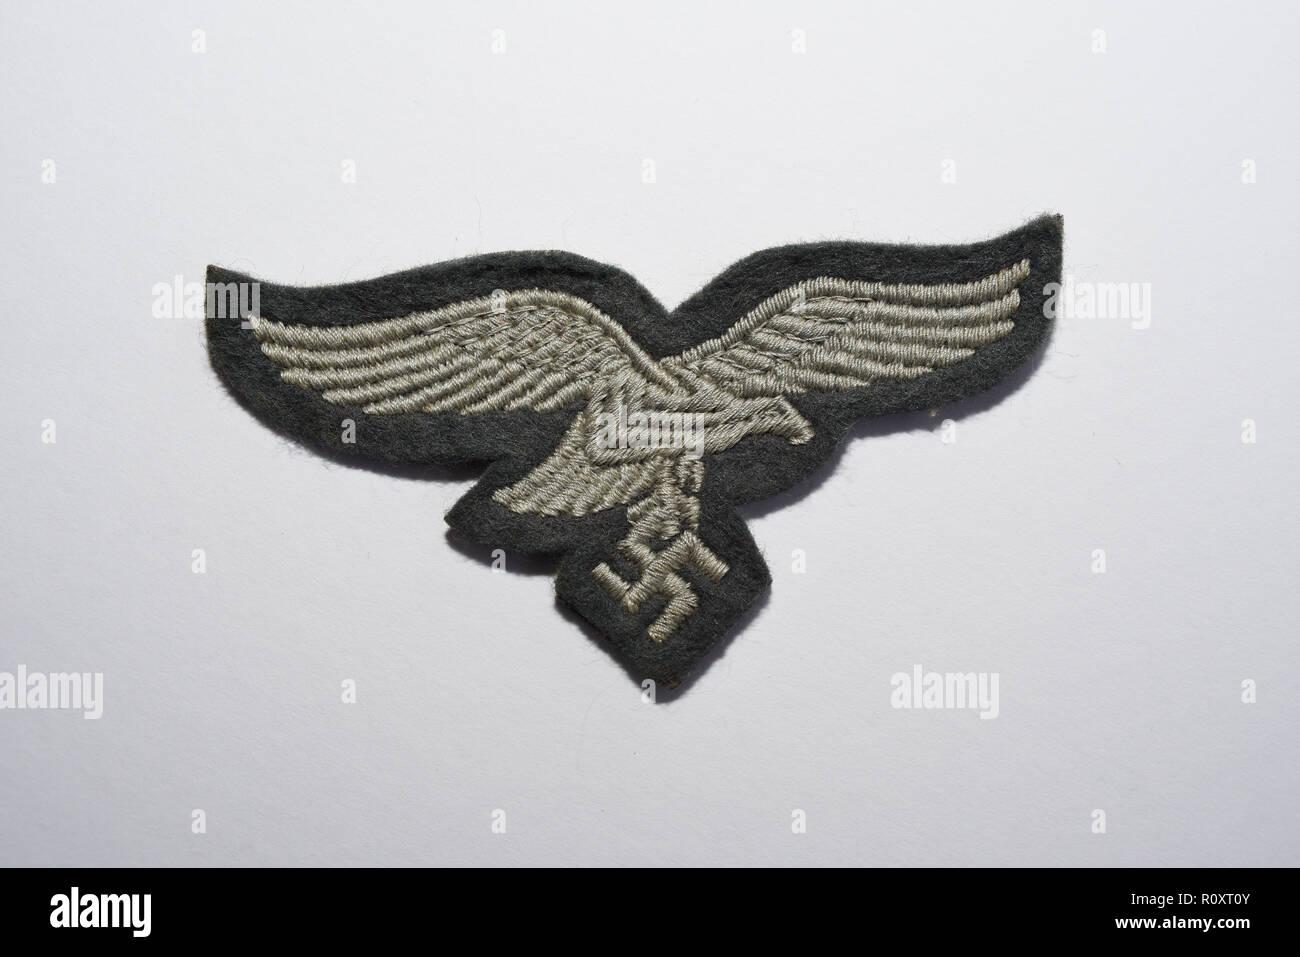 Second World War German Nazi Luftwaffe eagle and swastika cloth